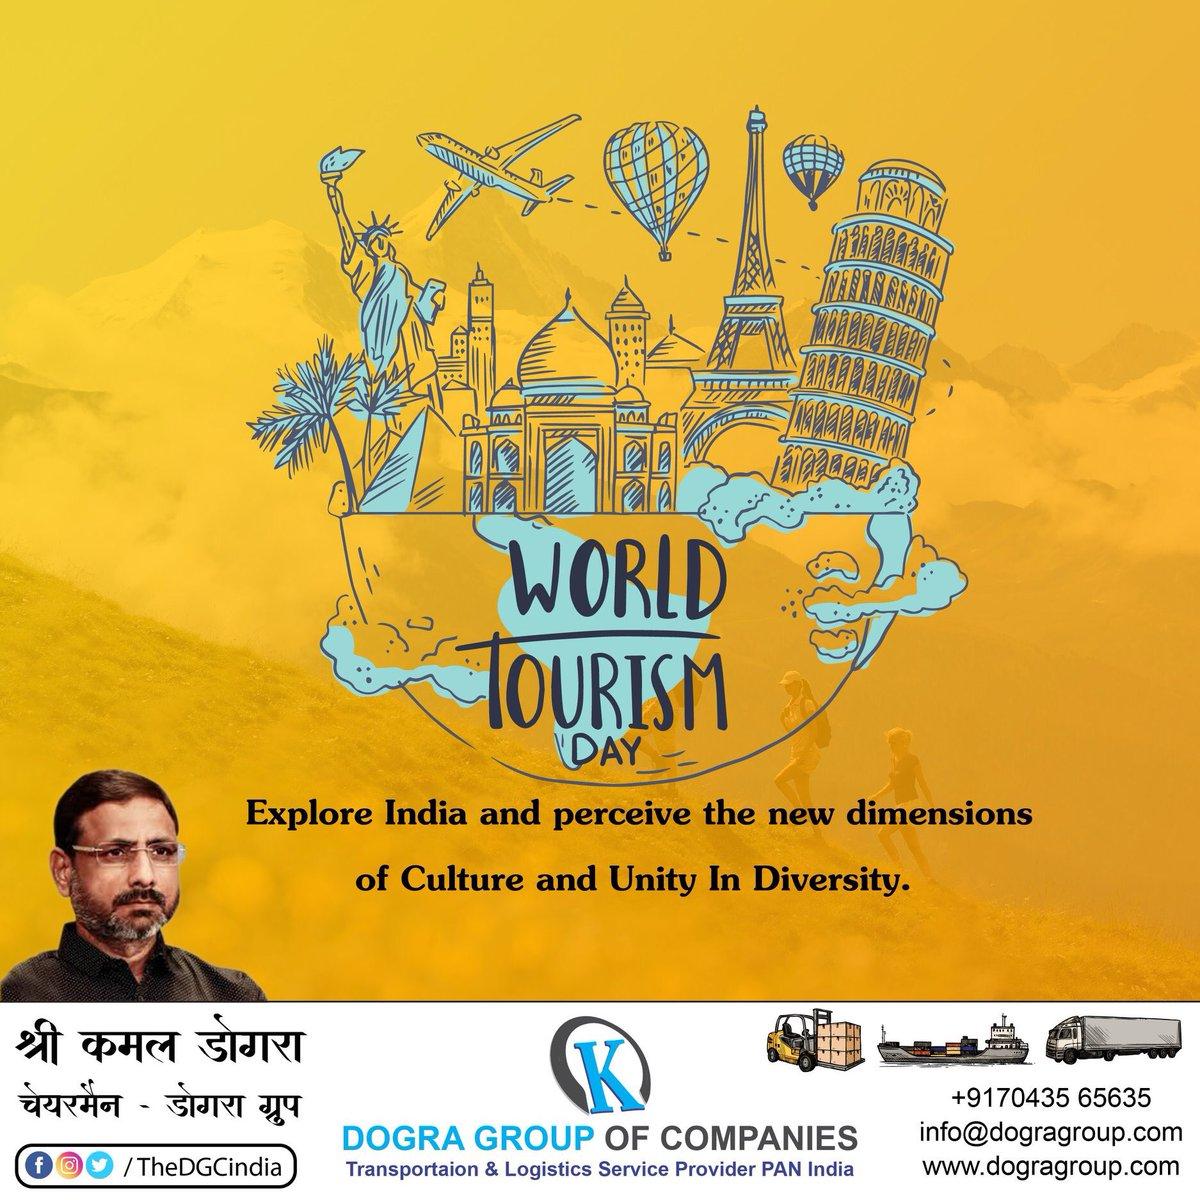 World Tourism Day     India is a land of diverse cultural, natural beauty, rich history and millennium old heritage.    #DGC #DograGroupOfCompanies #DograGroup #Transportation #LogisticsService #PANIndia  #KTPL #KamalTranslinkPvtLtd #KamalDogra #WorldTourismDay  #TourismDay https://t.co/Y3C64i2joz